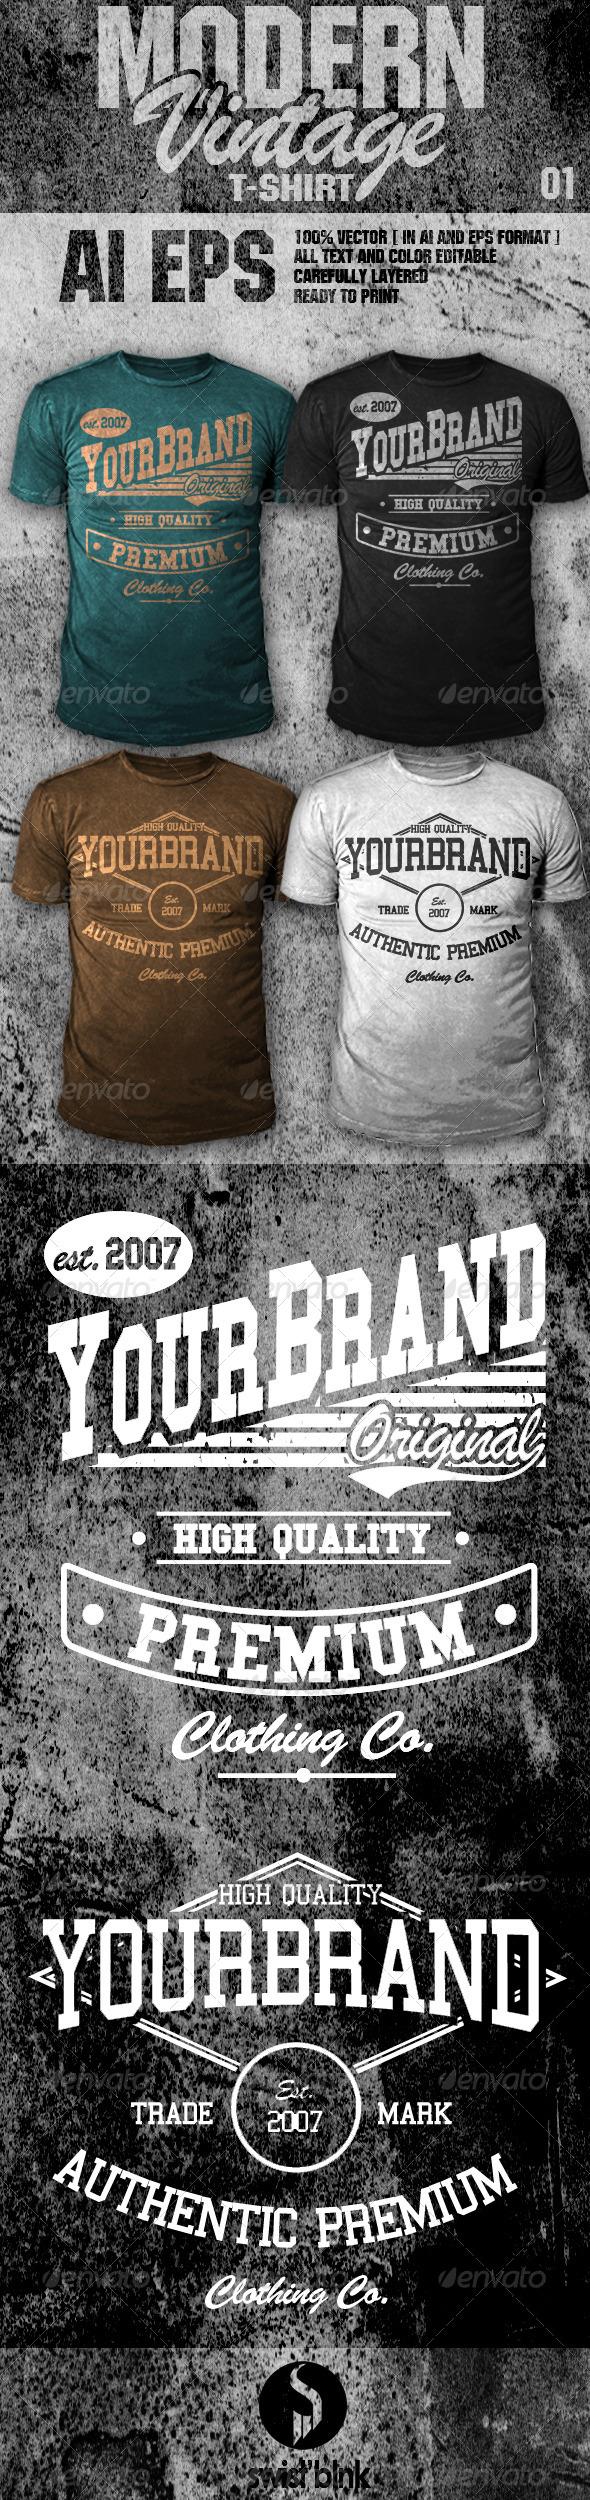 GraphicRiver Modern Vintage T-Shirt 01 6594379